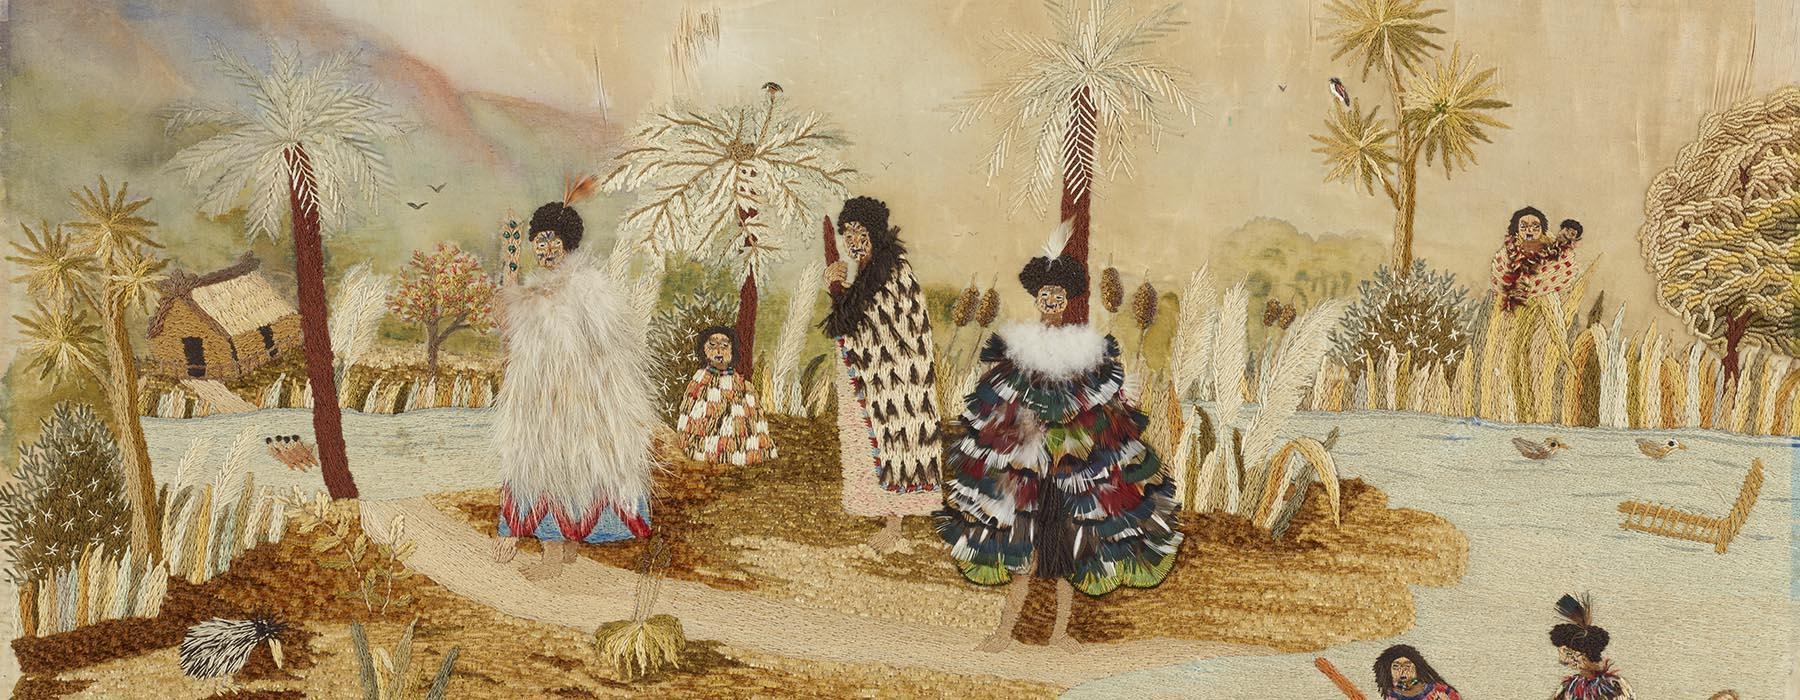 An embroidered scene of a Maori village